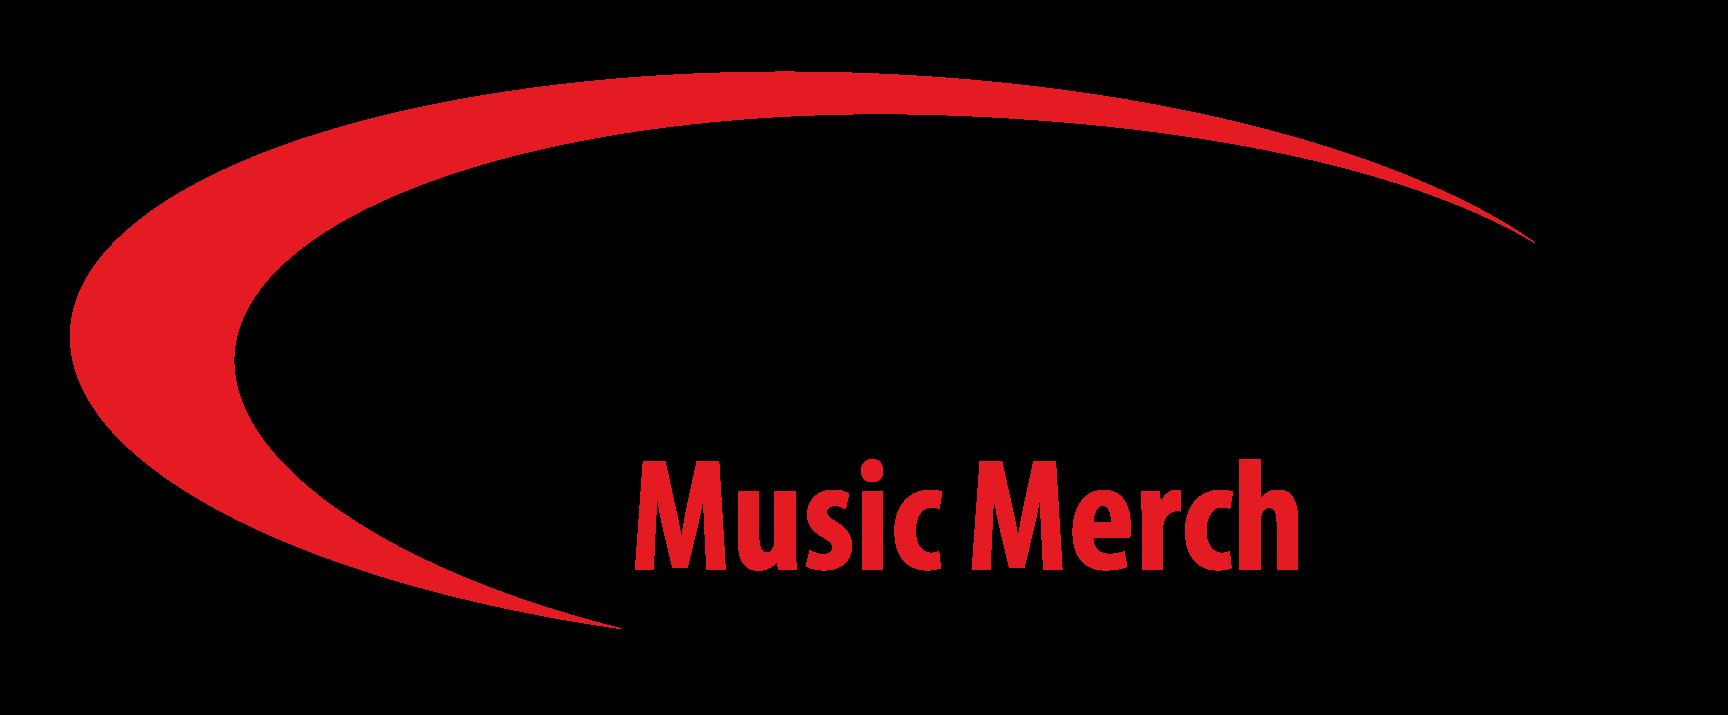 NewBay Music Merch